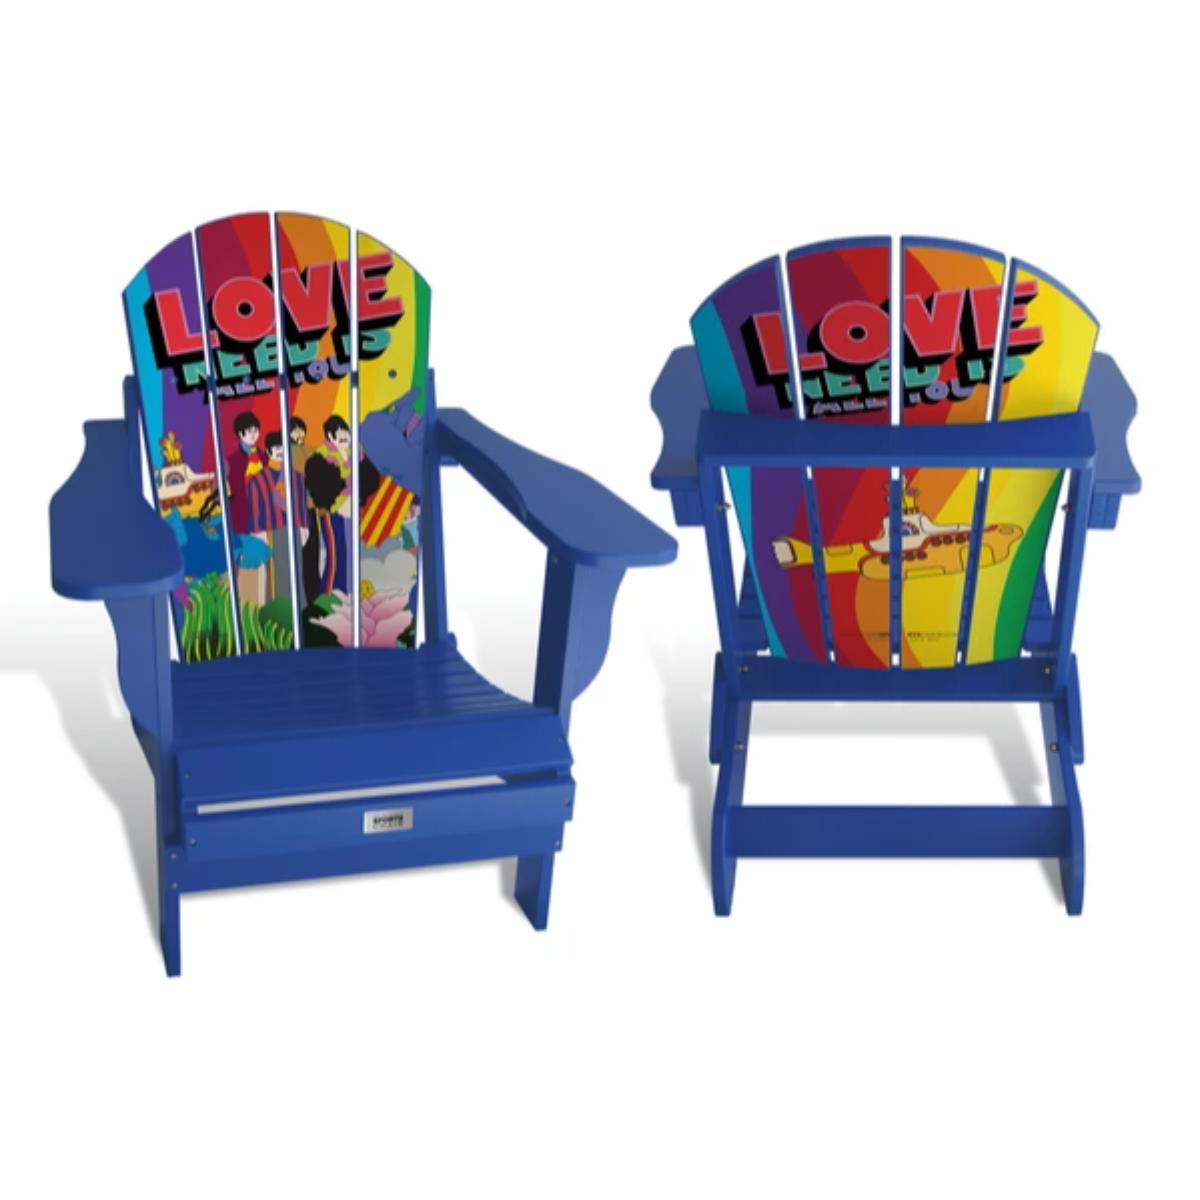 All You Need Is Love Custom Adult Folding Adirondack Chair